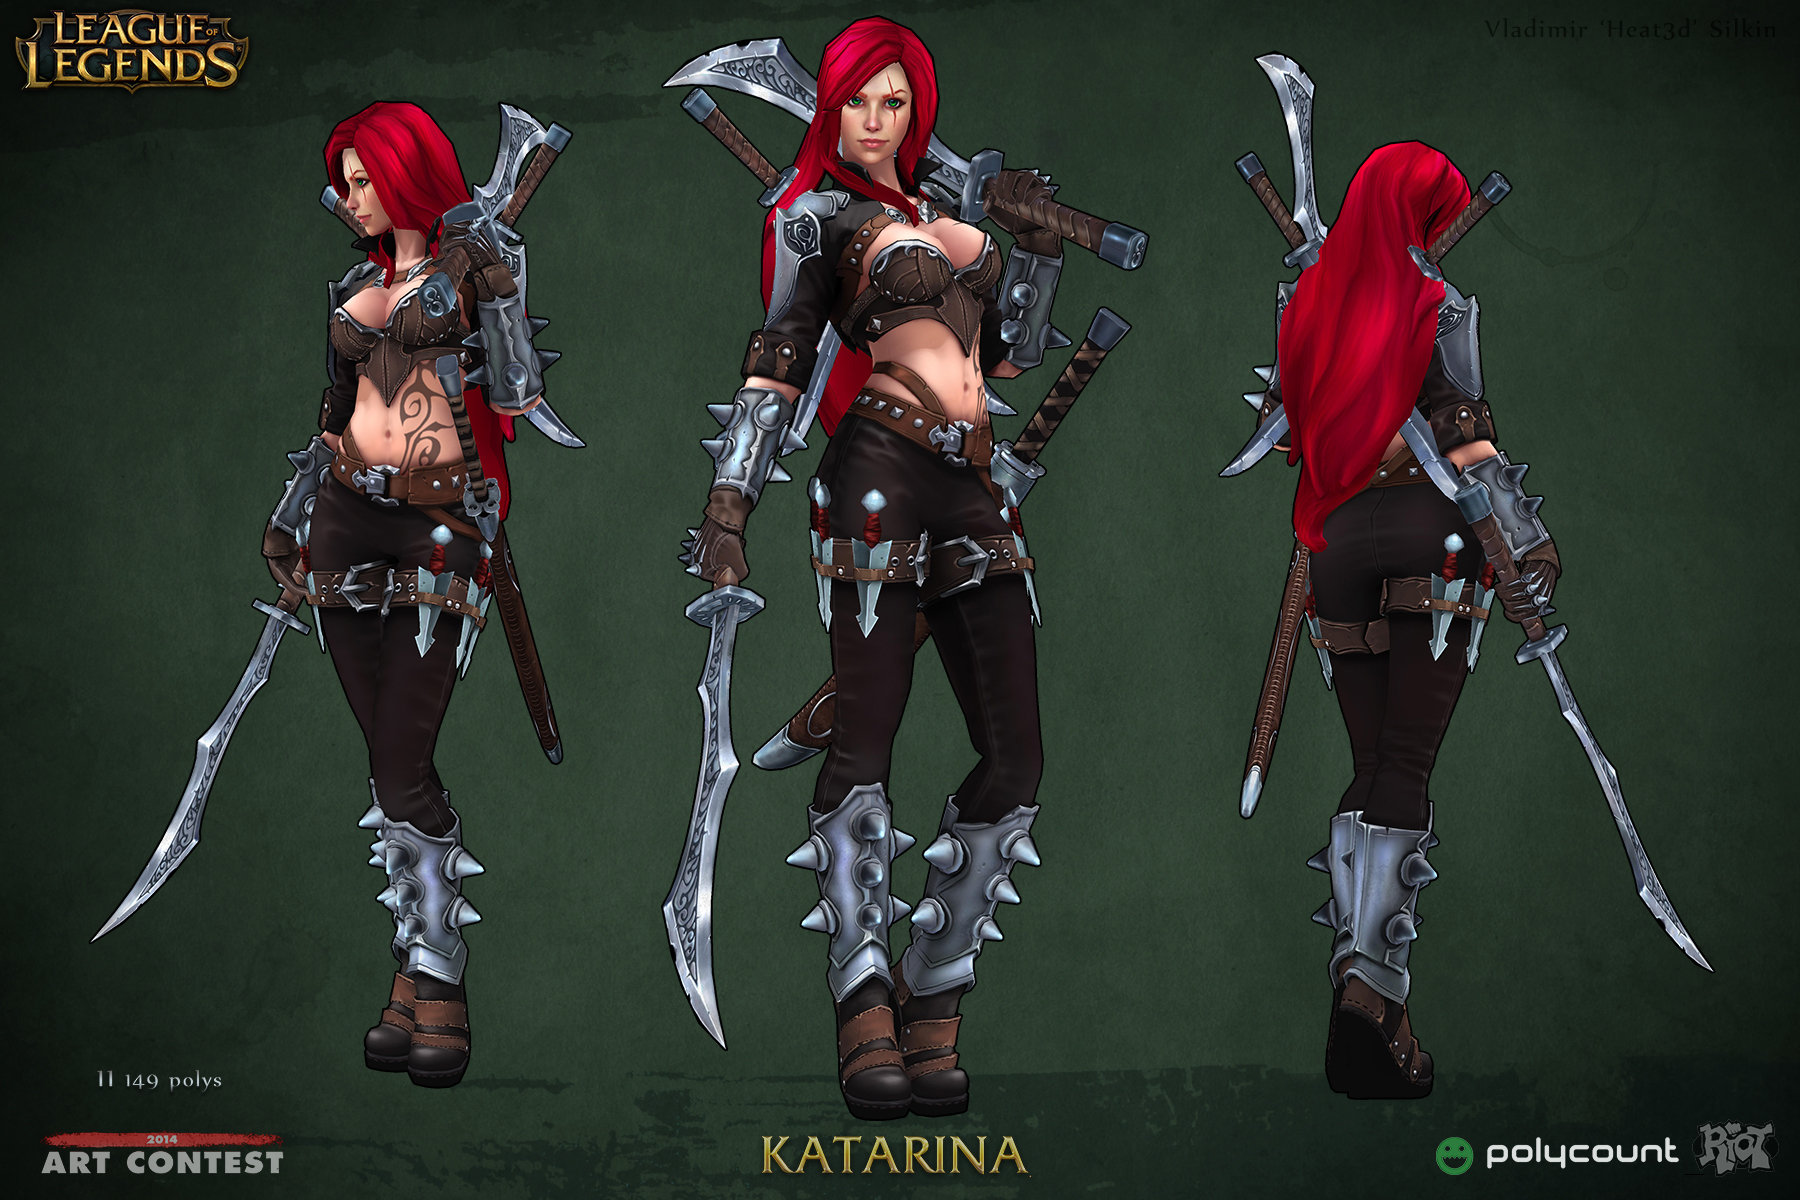 League Of Legends Character Design Contest : Artstation league of legends katarina vladimir silkin